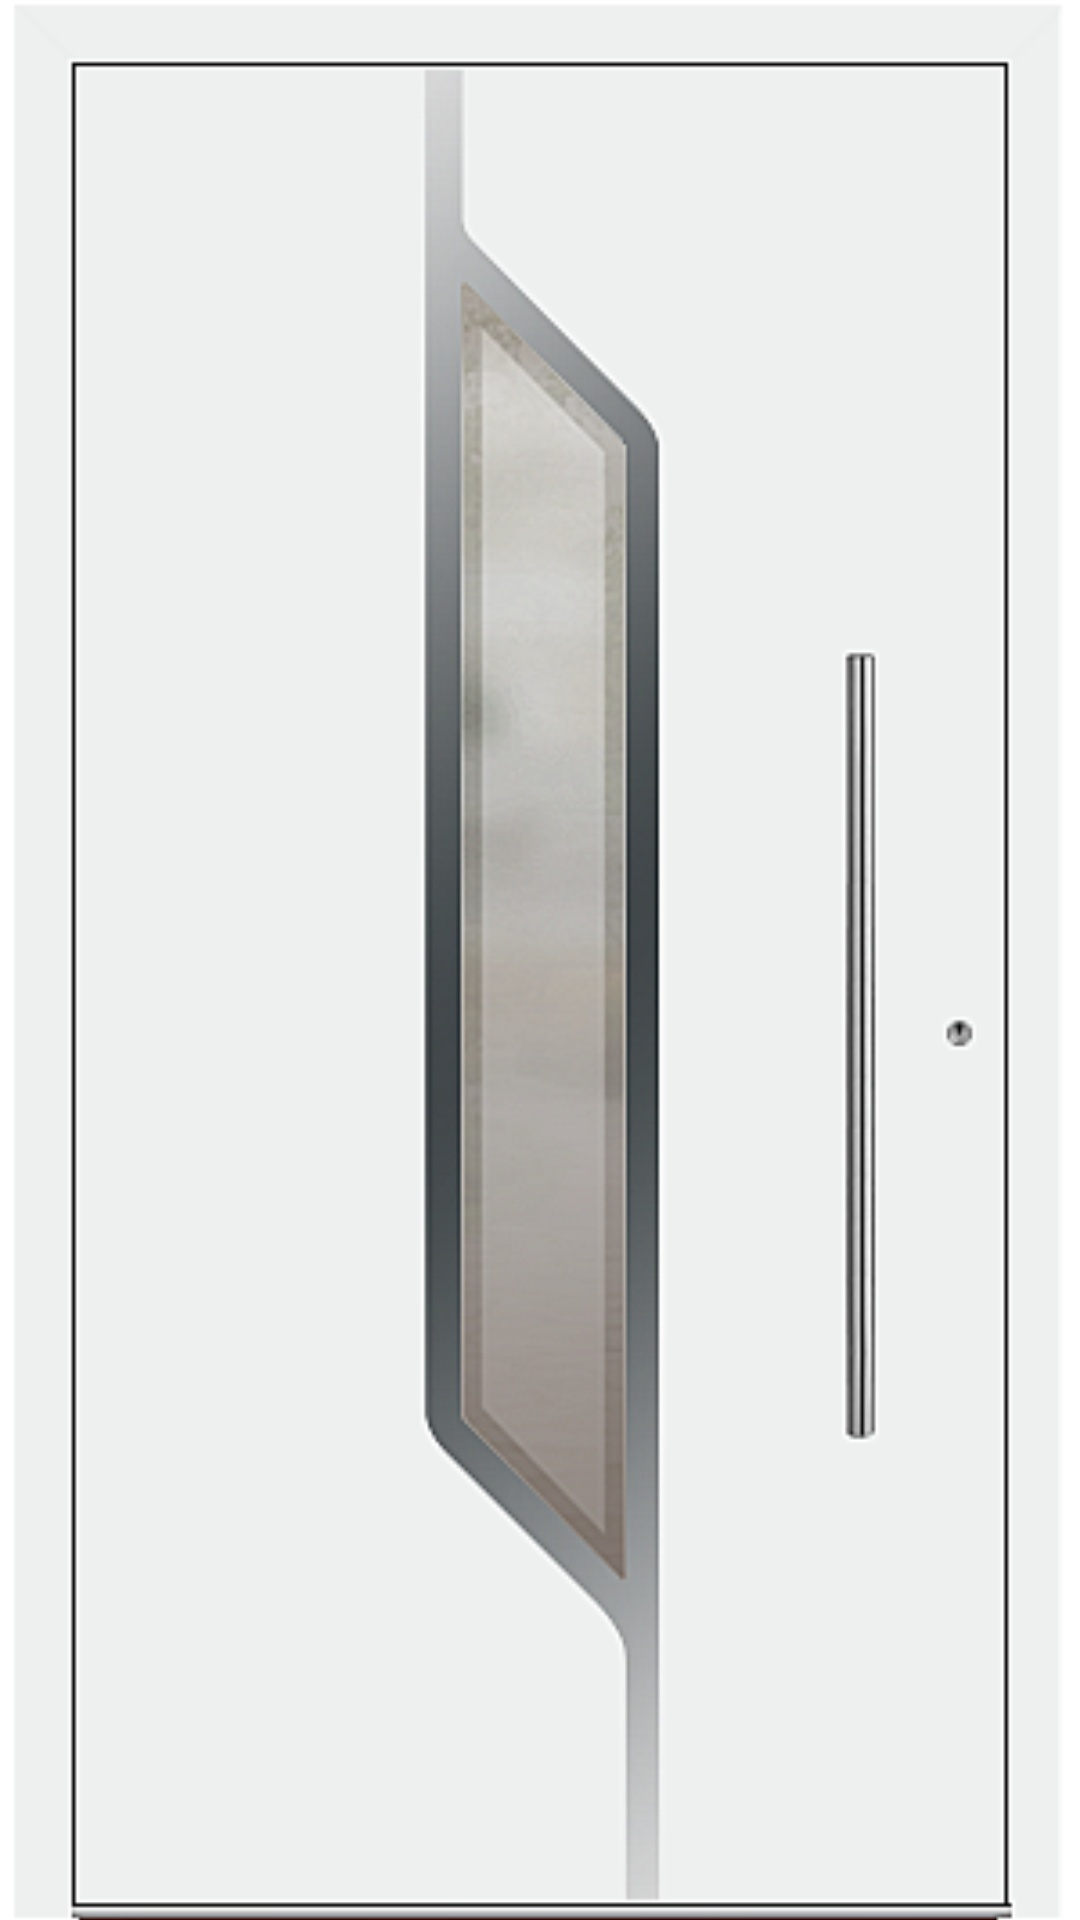 PaXentrée Aluminium Haustür M07120 weiß